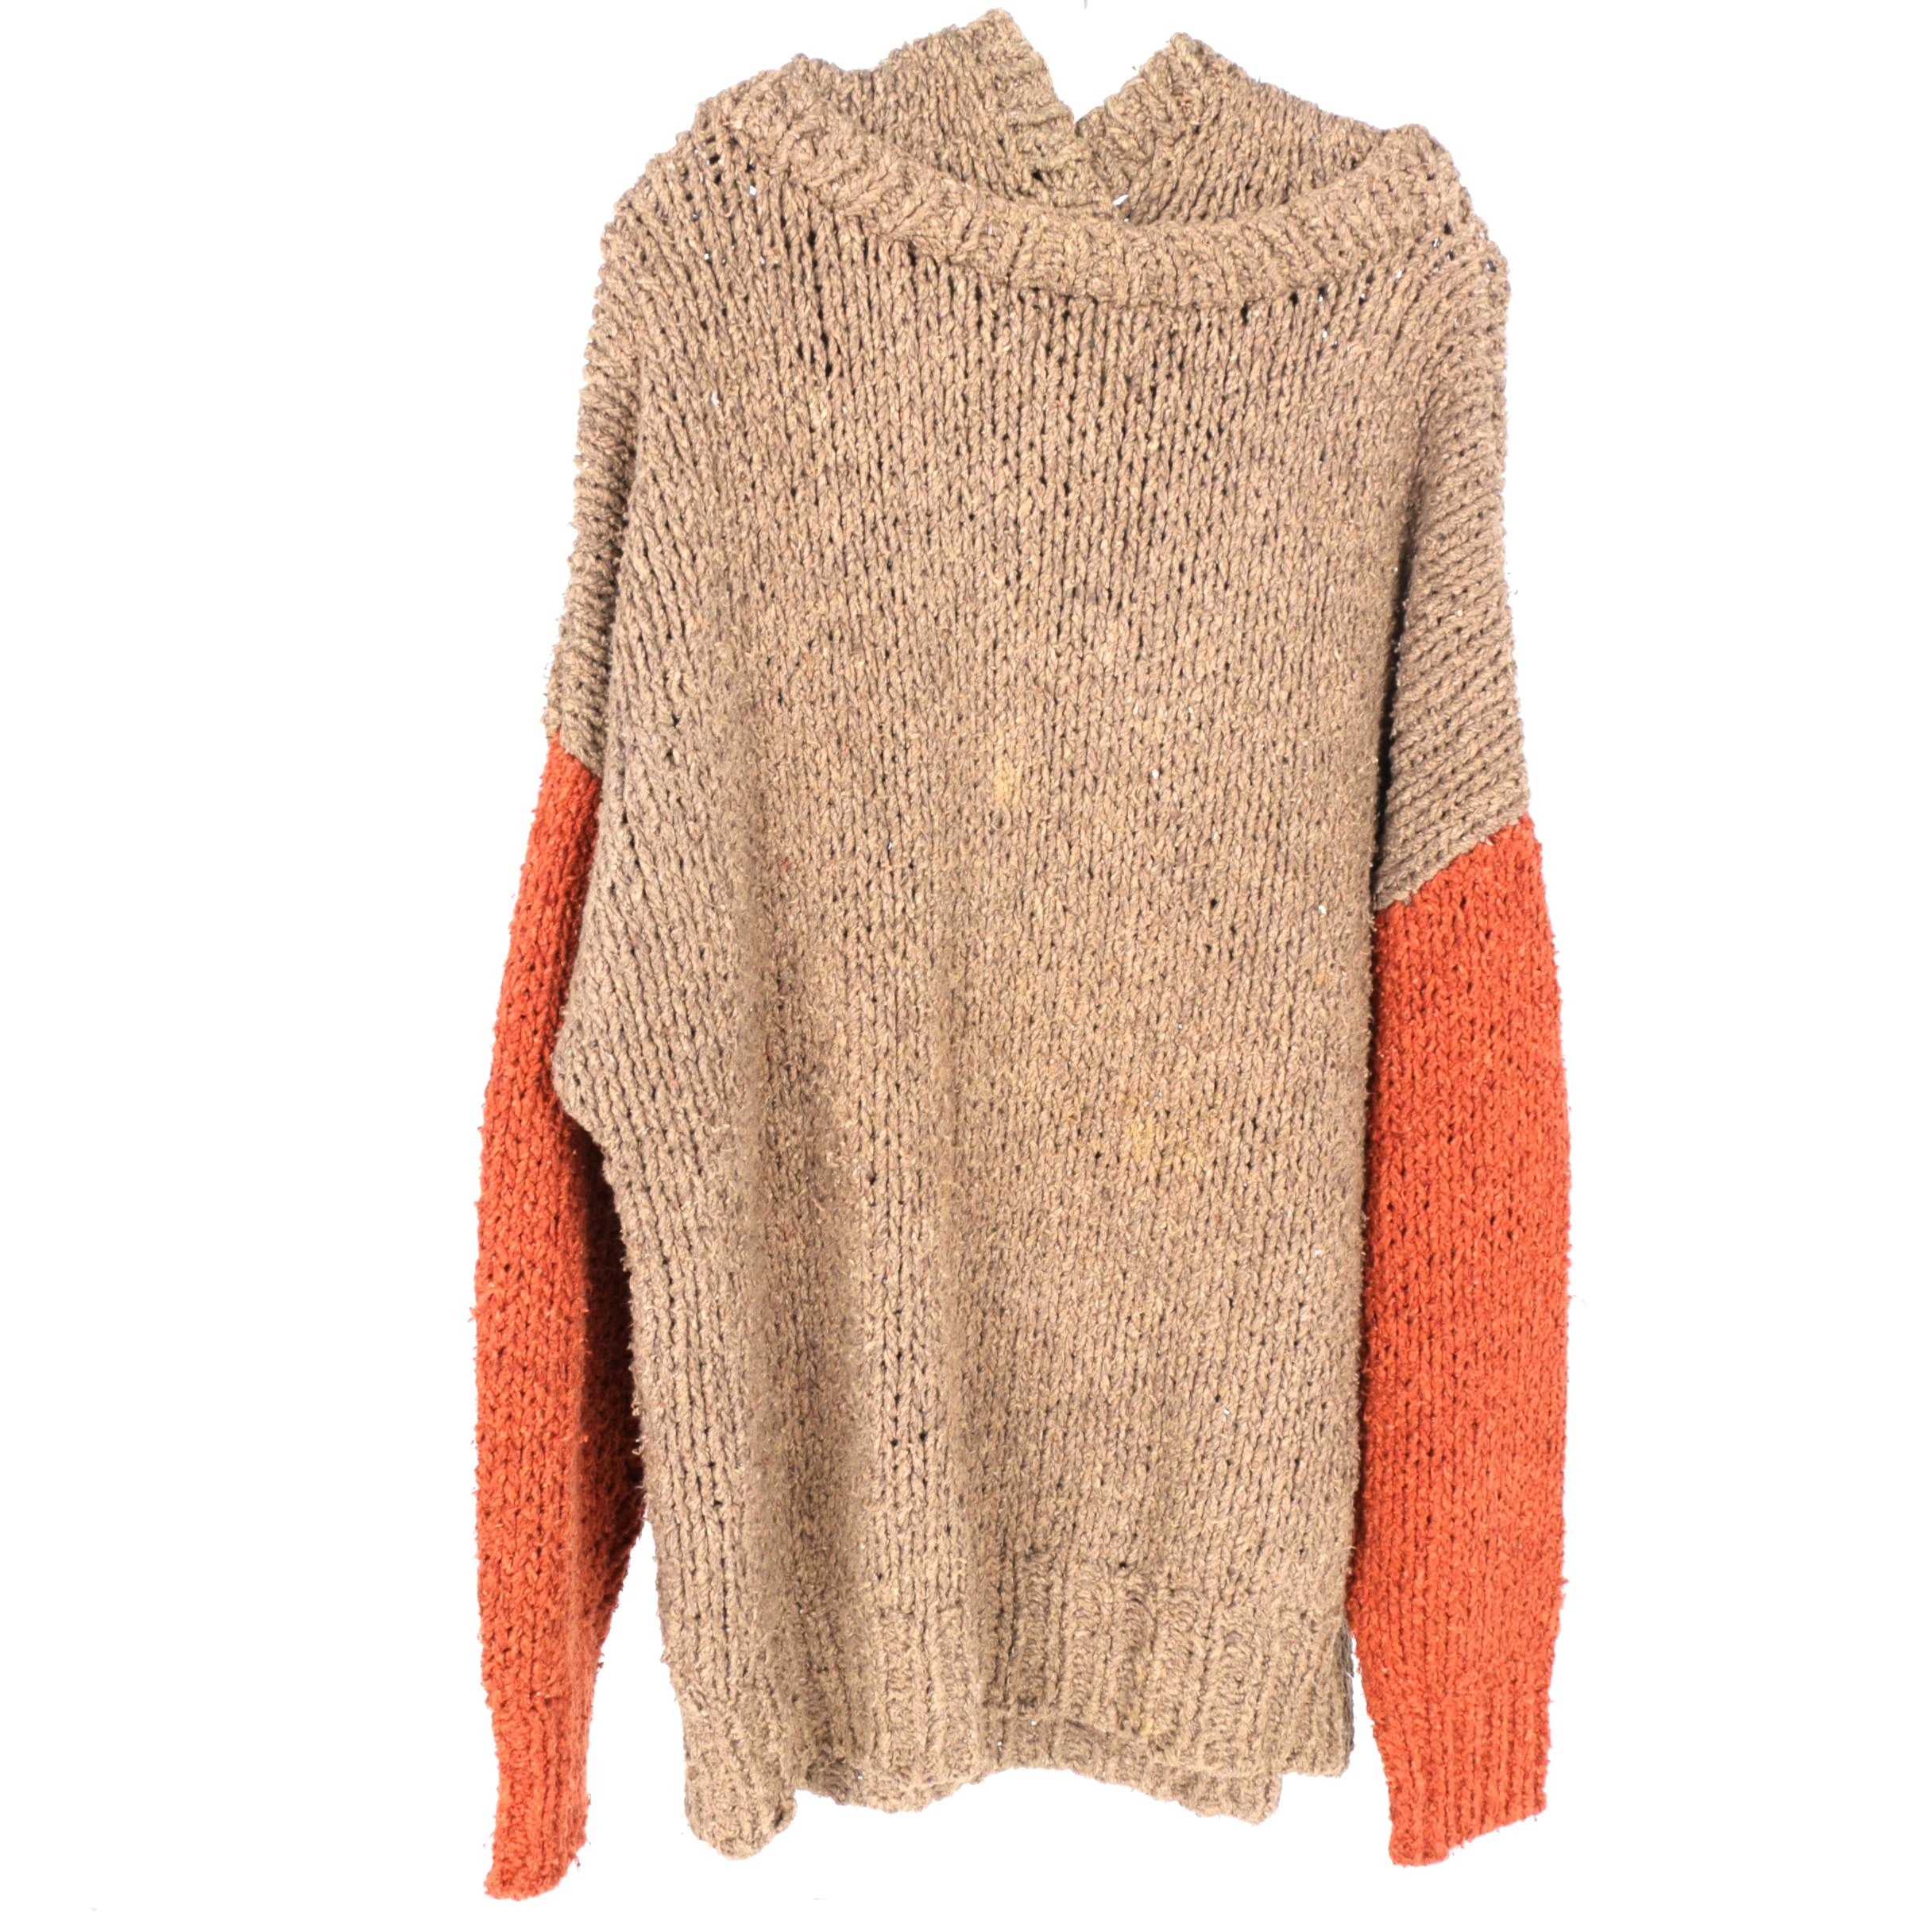 Plantation Women's Knit Sweater